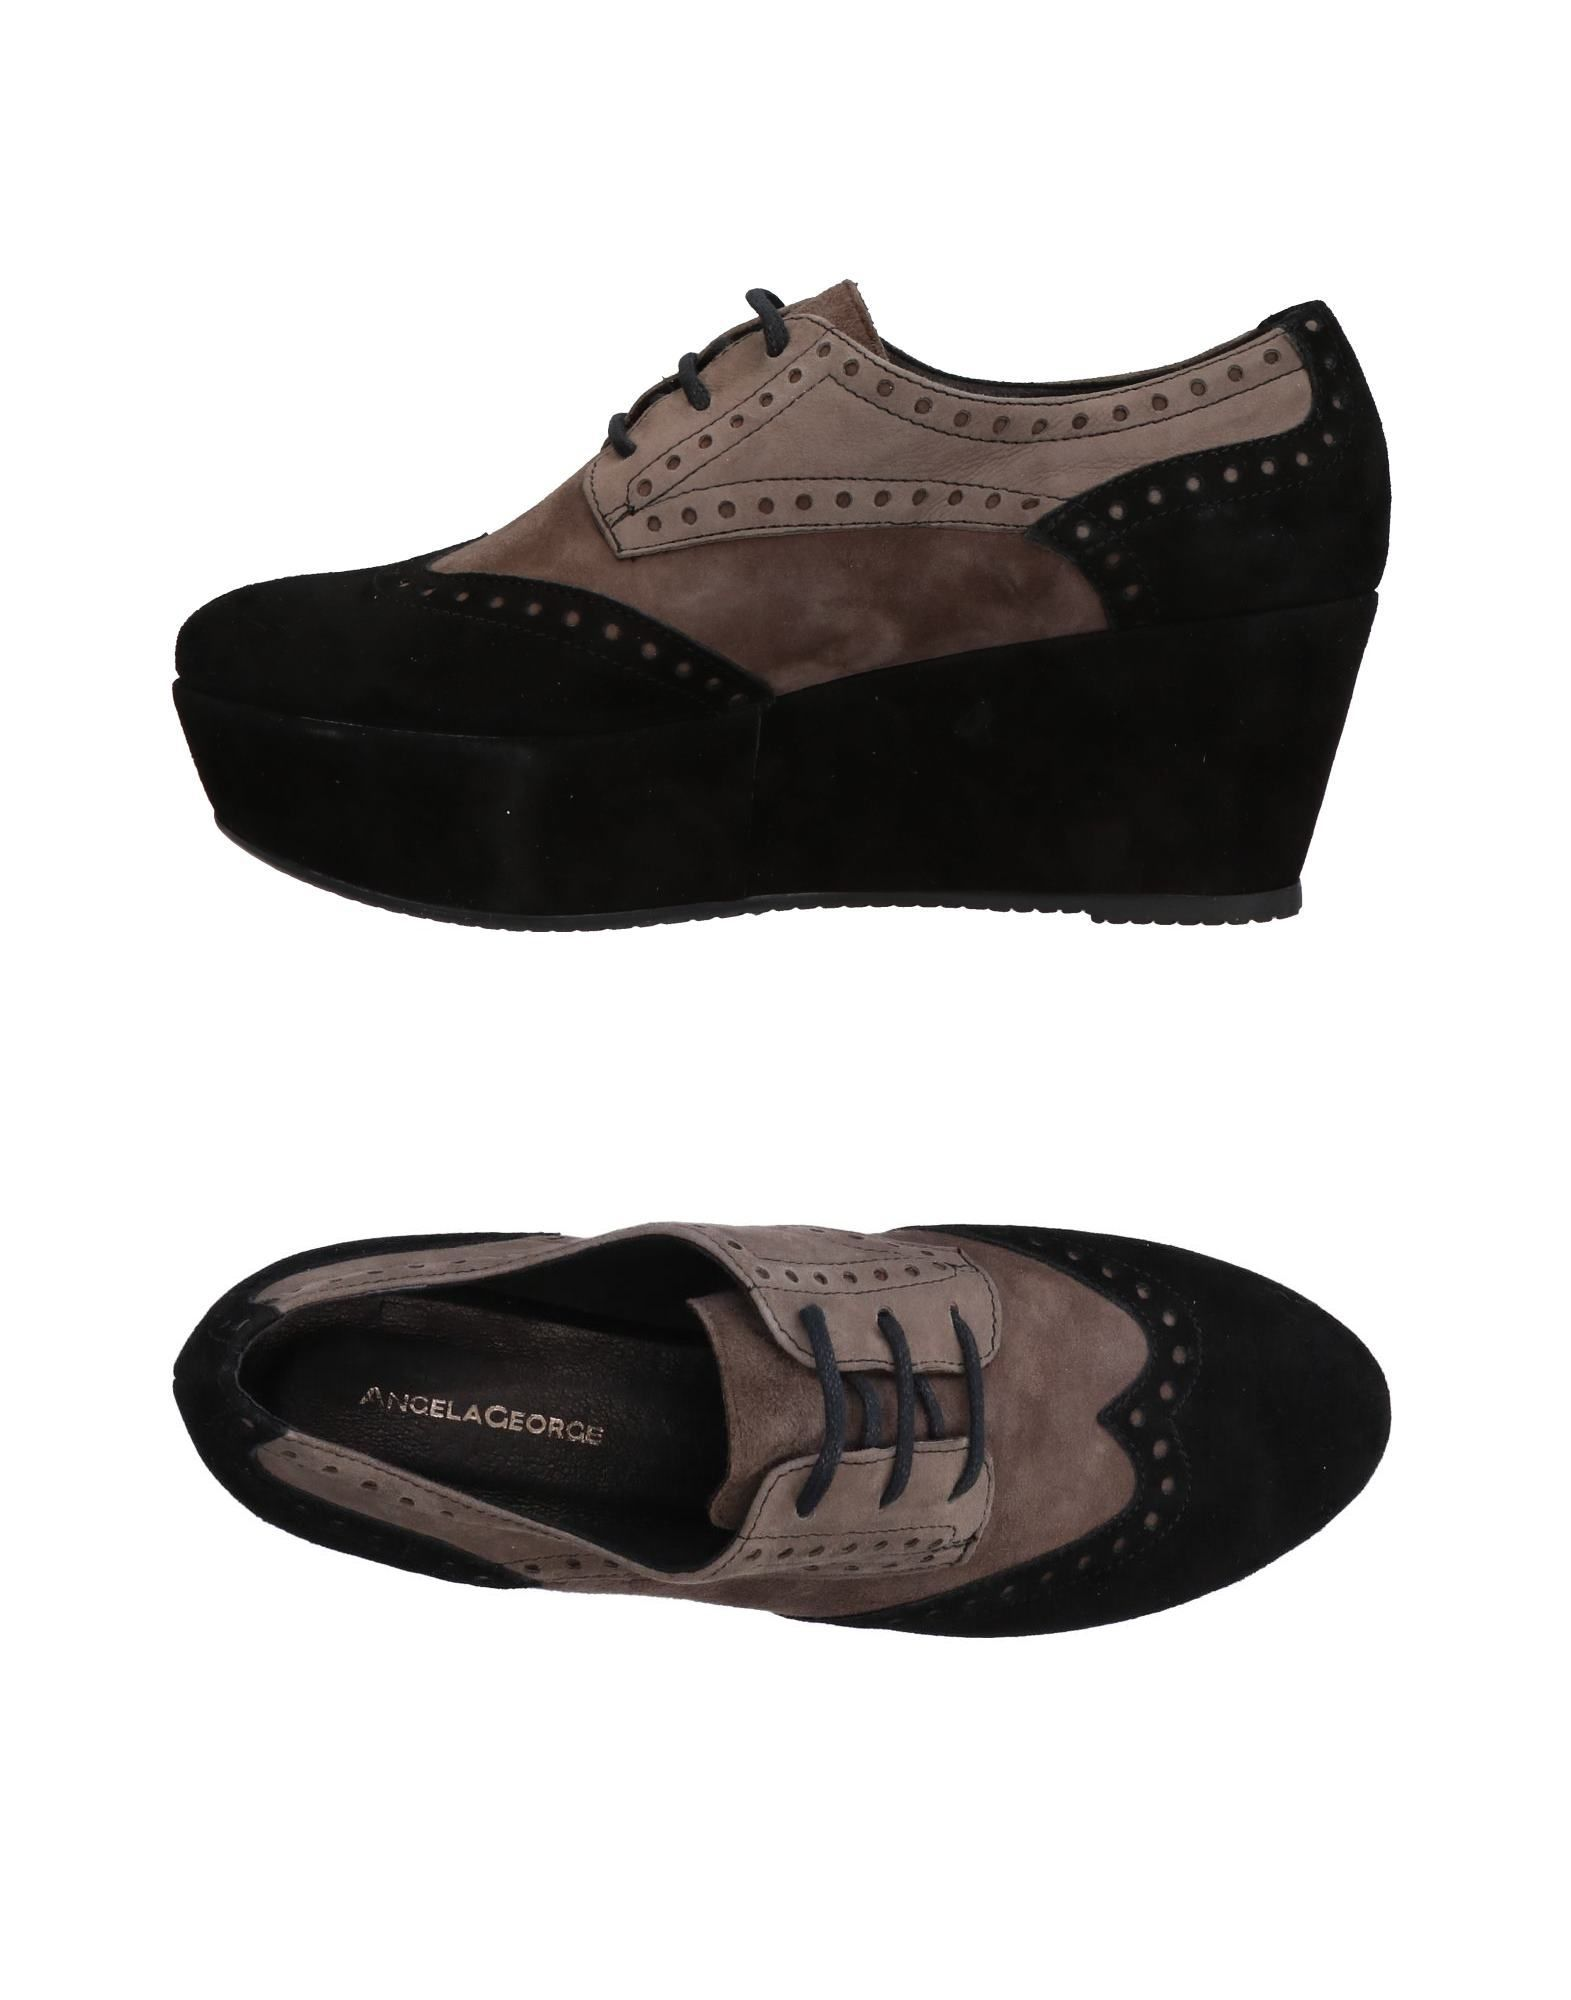 Chaussures À Lacets Angela George Femme - Chaussures À Lacets Angela George sur